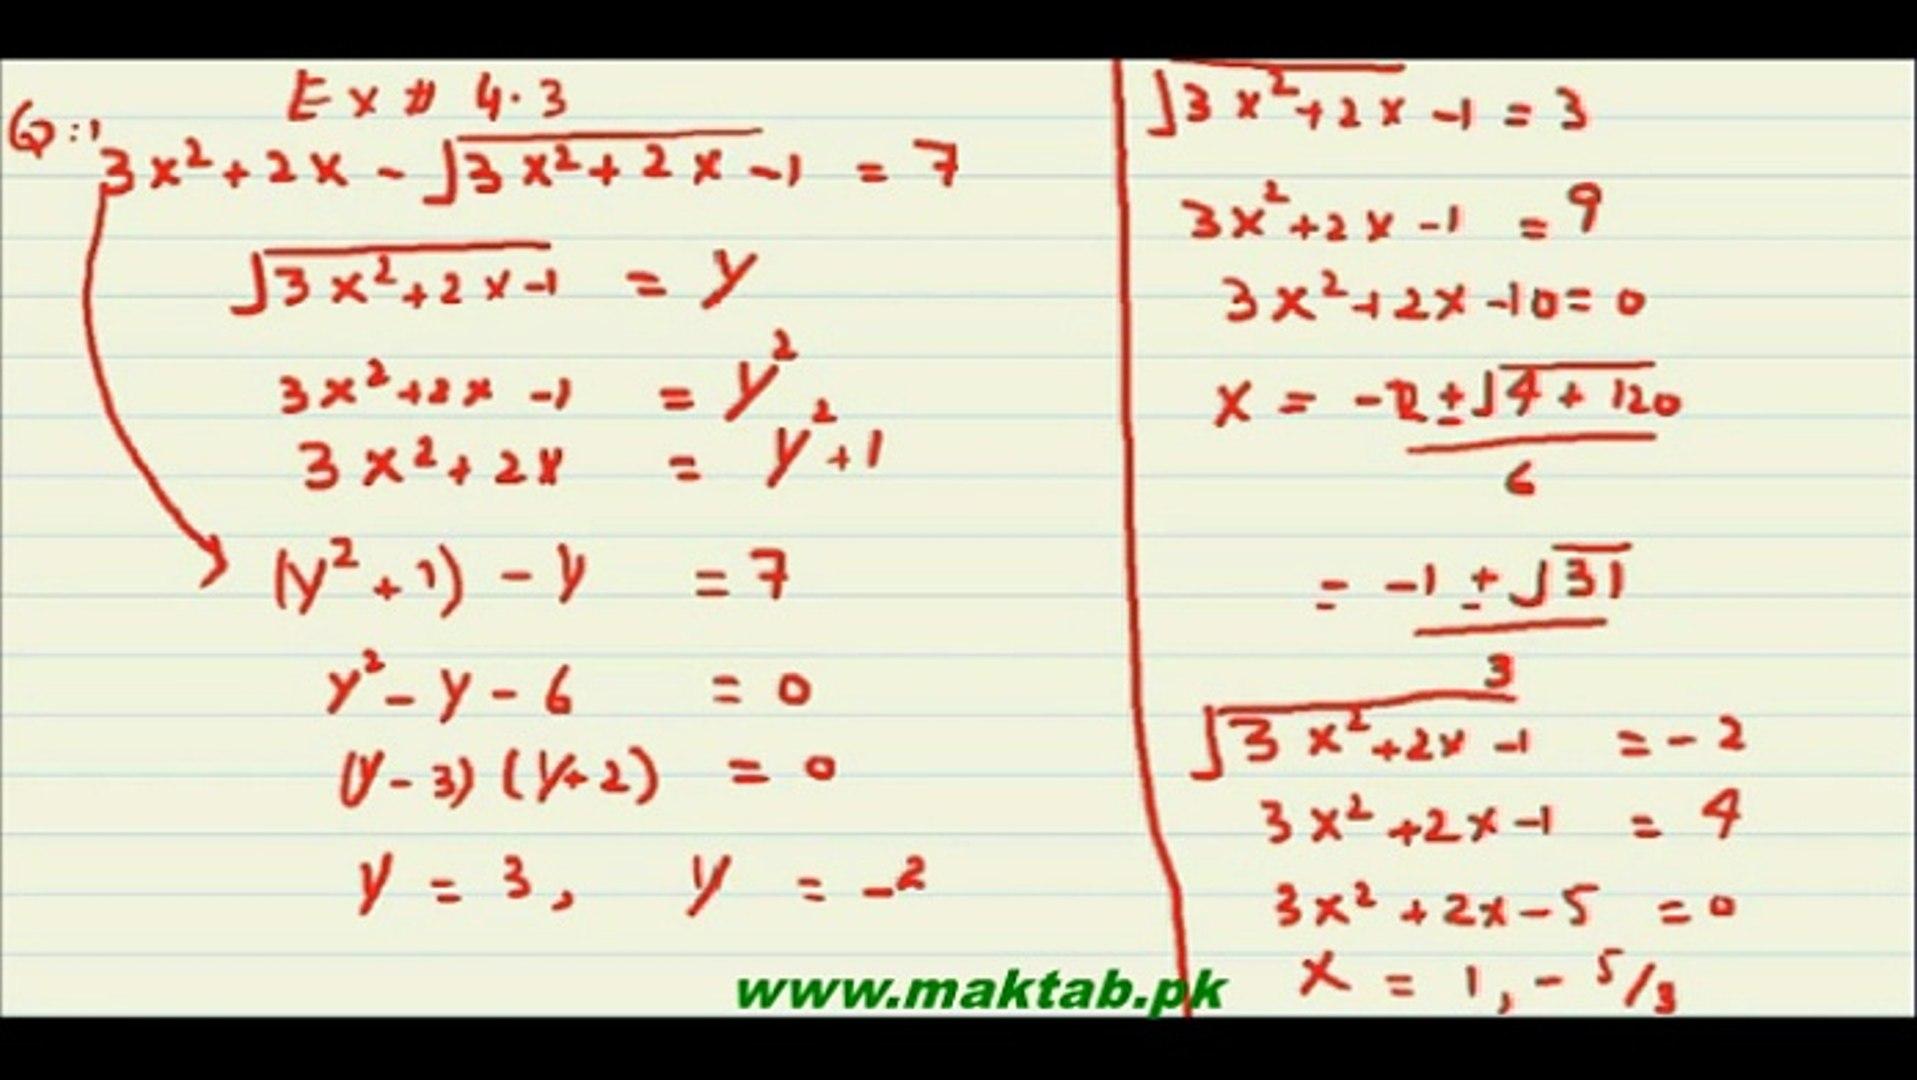 FSc Math Book1, CH 4, LEC 14: Ex 4 3 (Part 1)